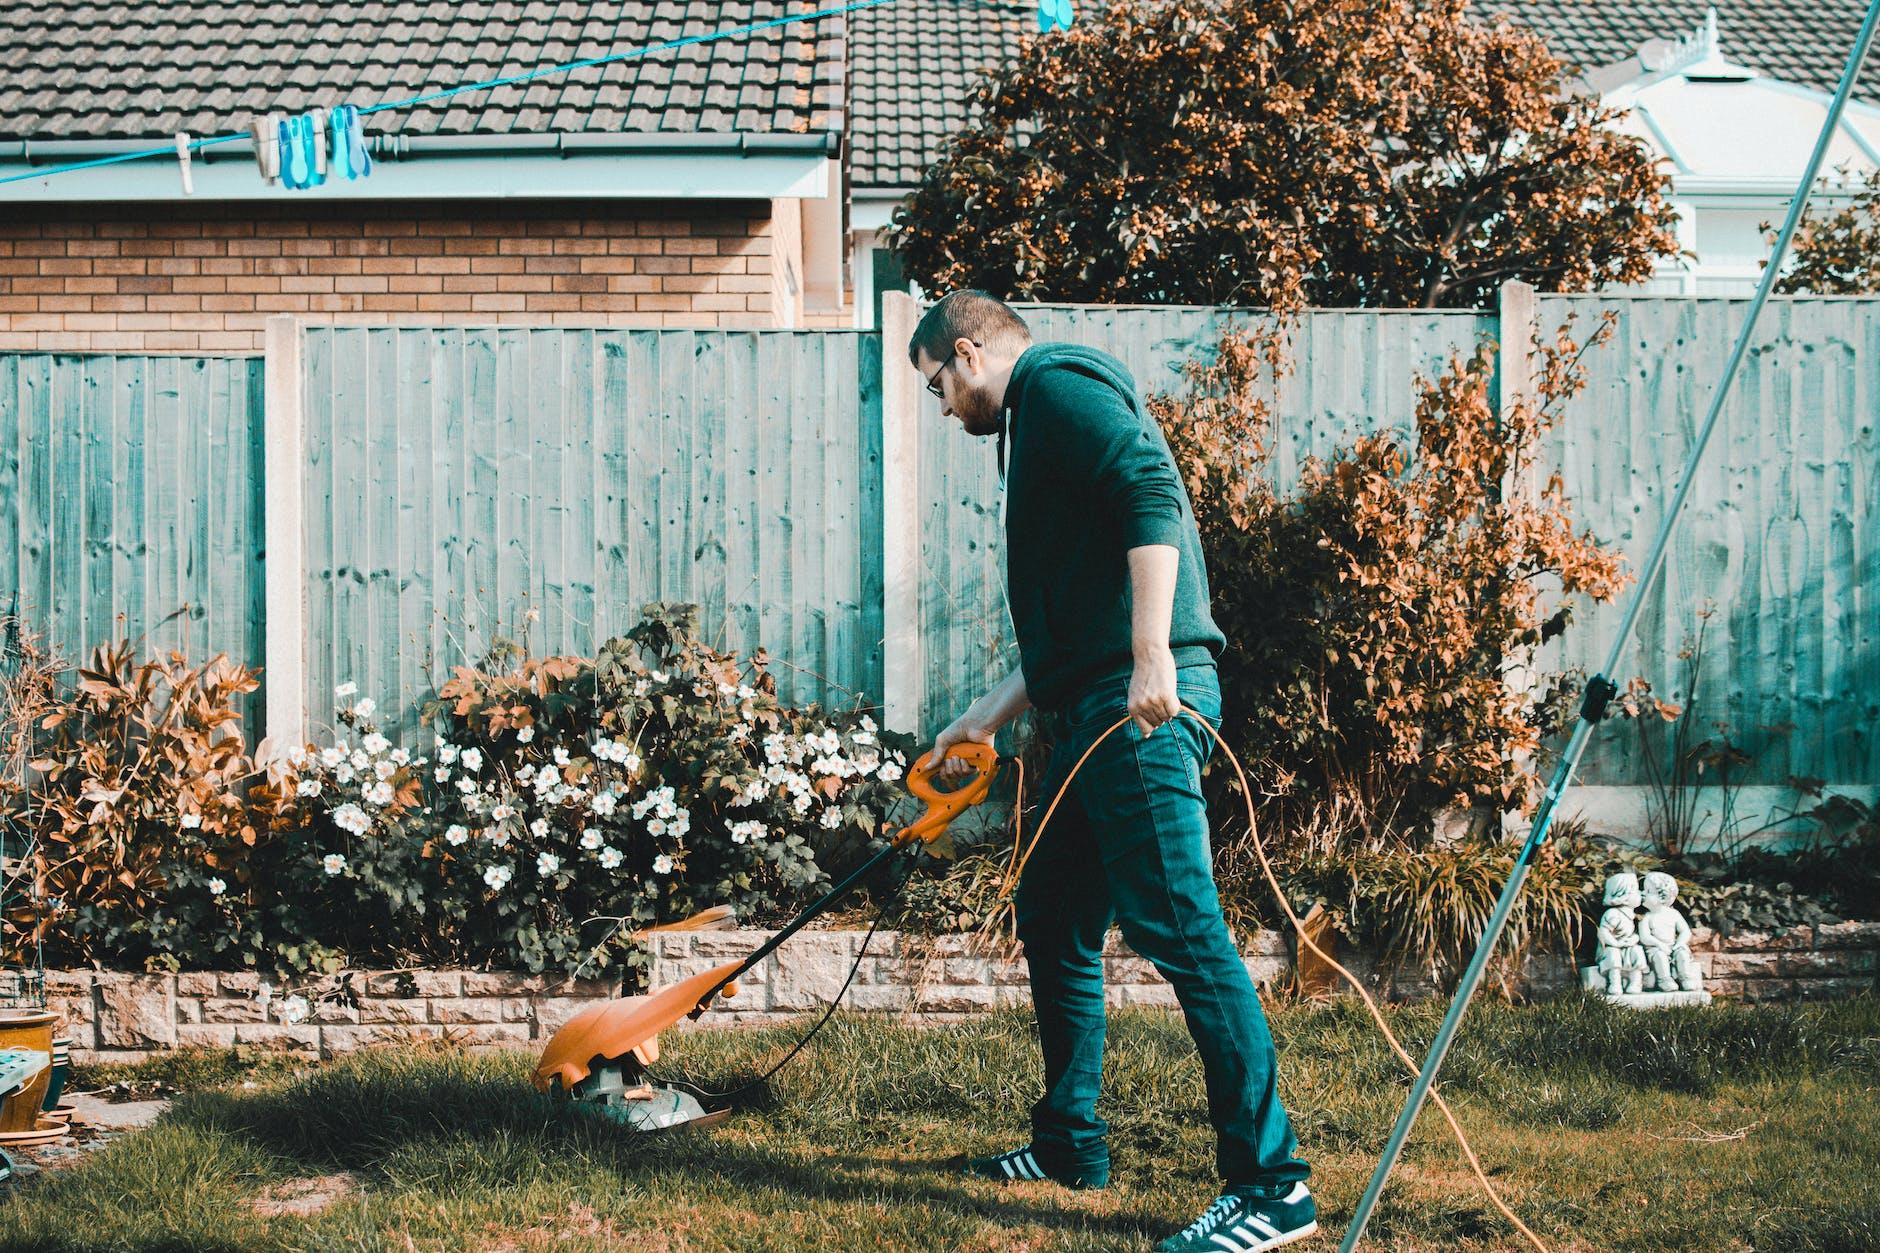 Man Using His Lawn Mower